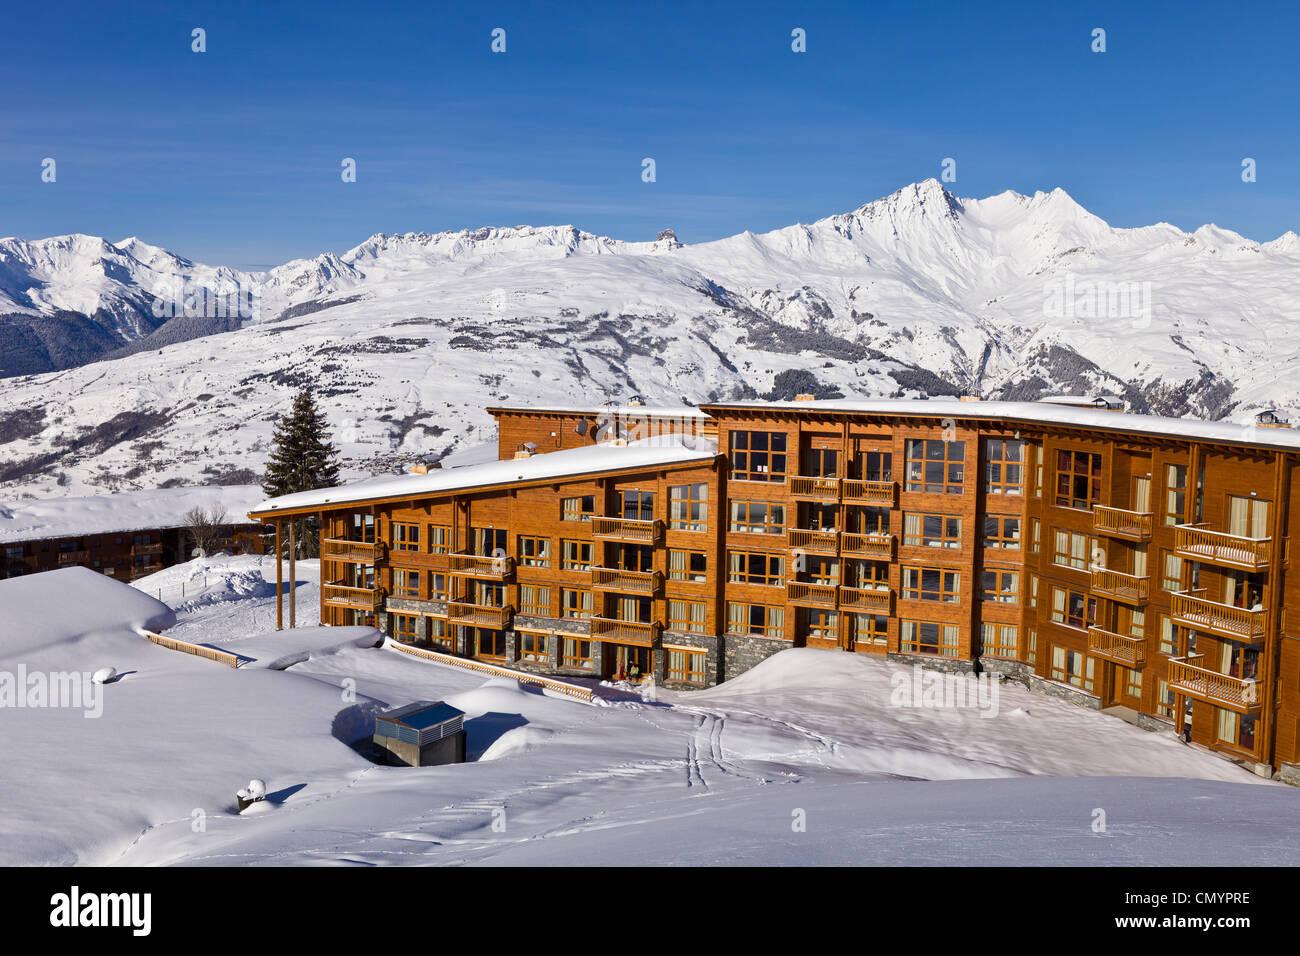 France, Savoie, Les Arcs 1800, Massif de La Vanoise, high Tarentaise valley, the residence Odalys EdenArc 1800 - Stock Image